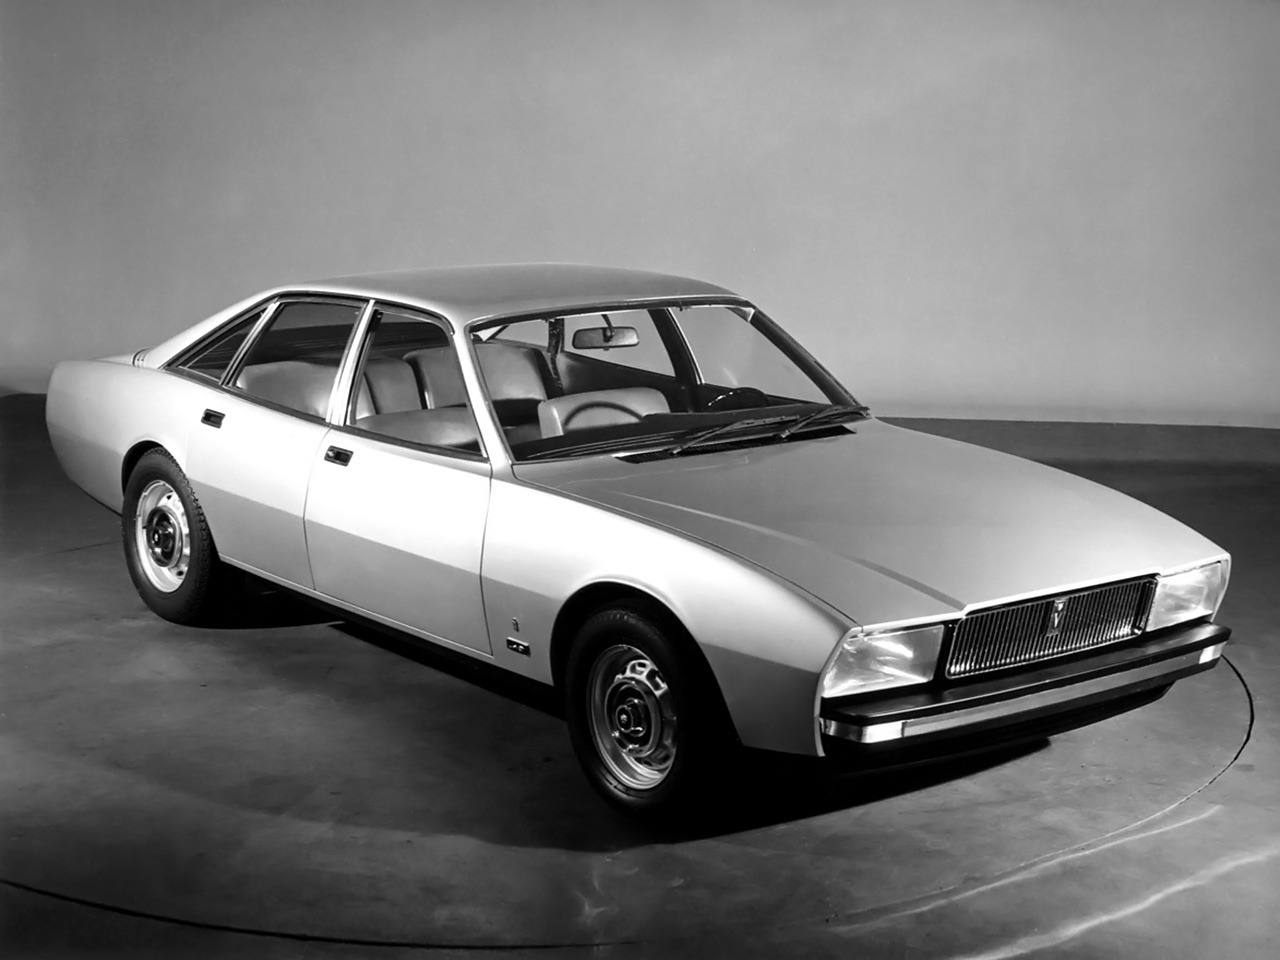 Jaguar XJ12 PF (1974) - Old Concept Cars